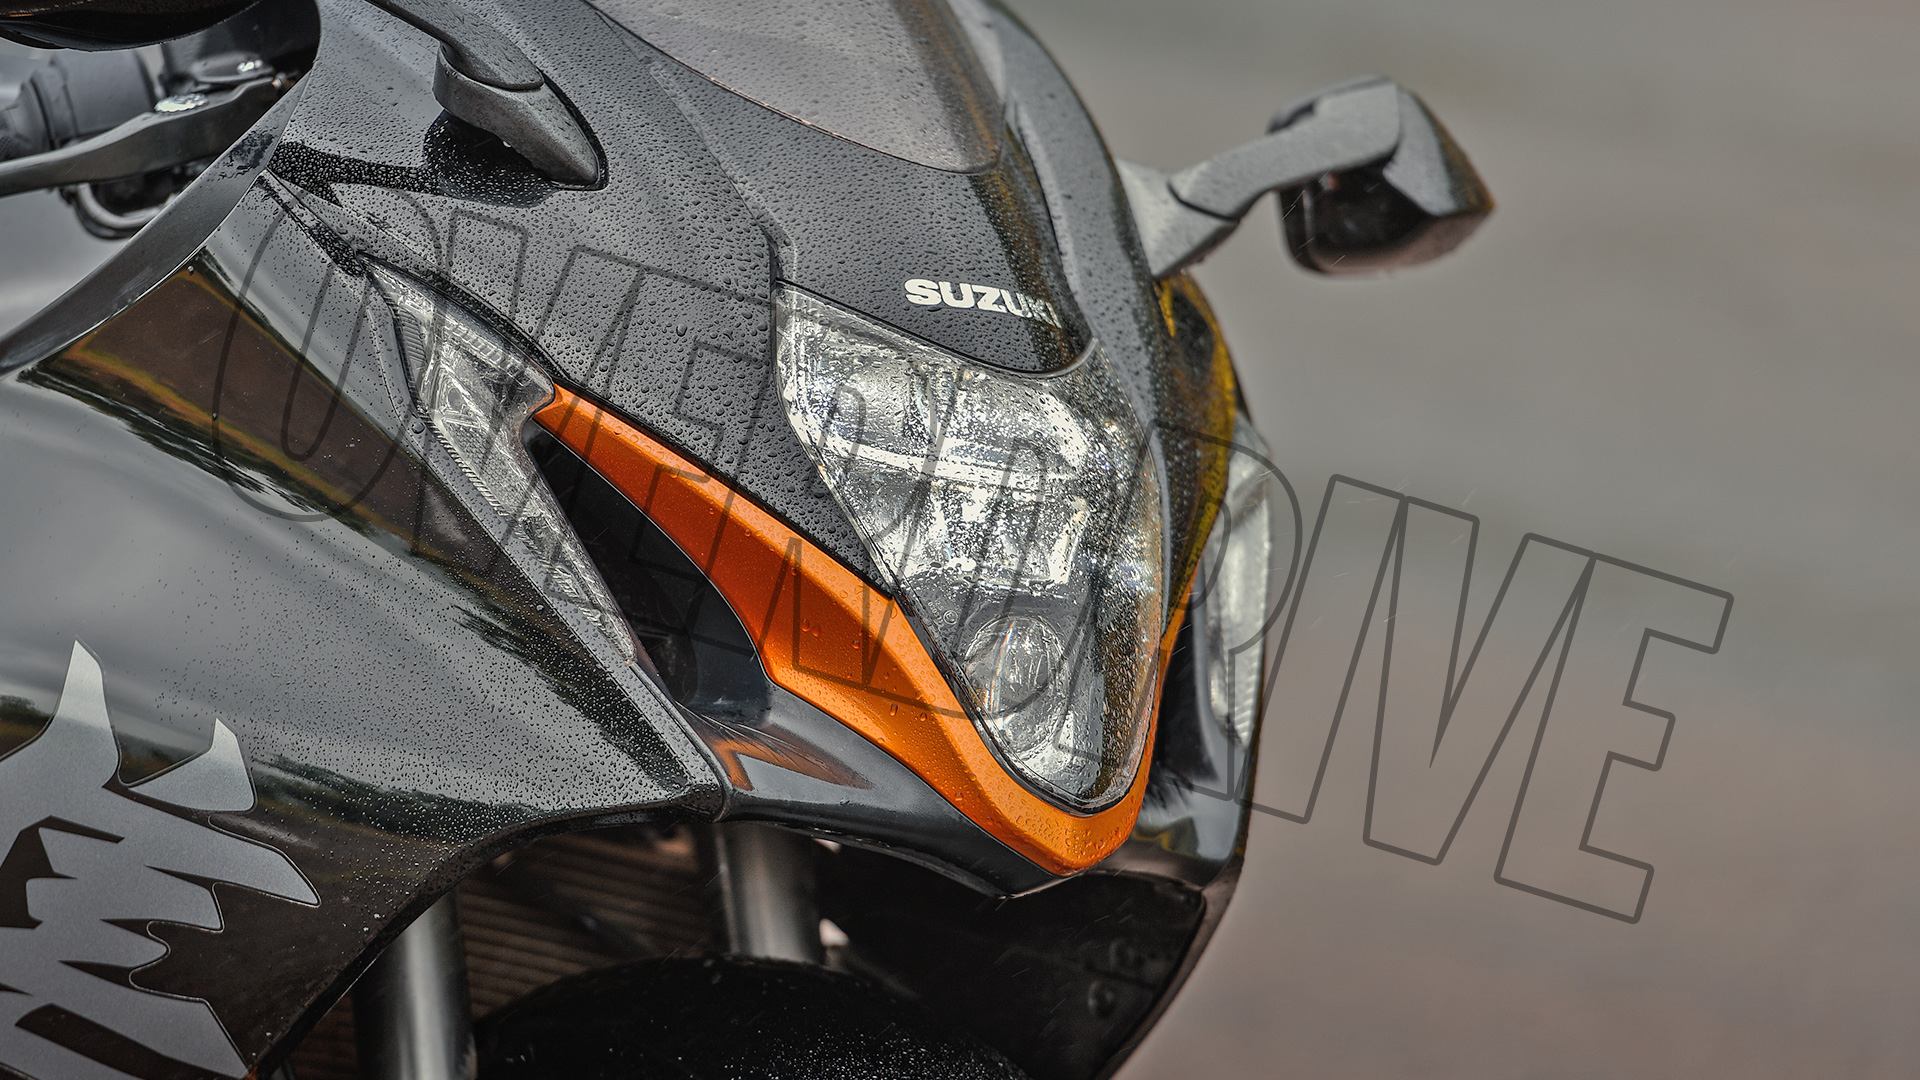 Suzuki Hayabusa 2021 STD